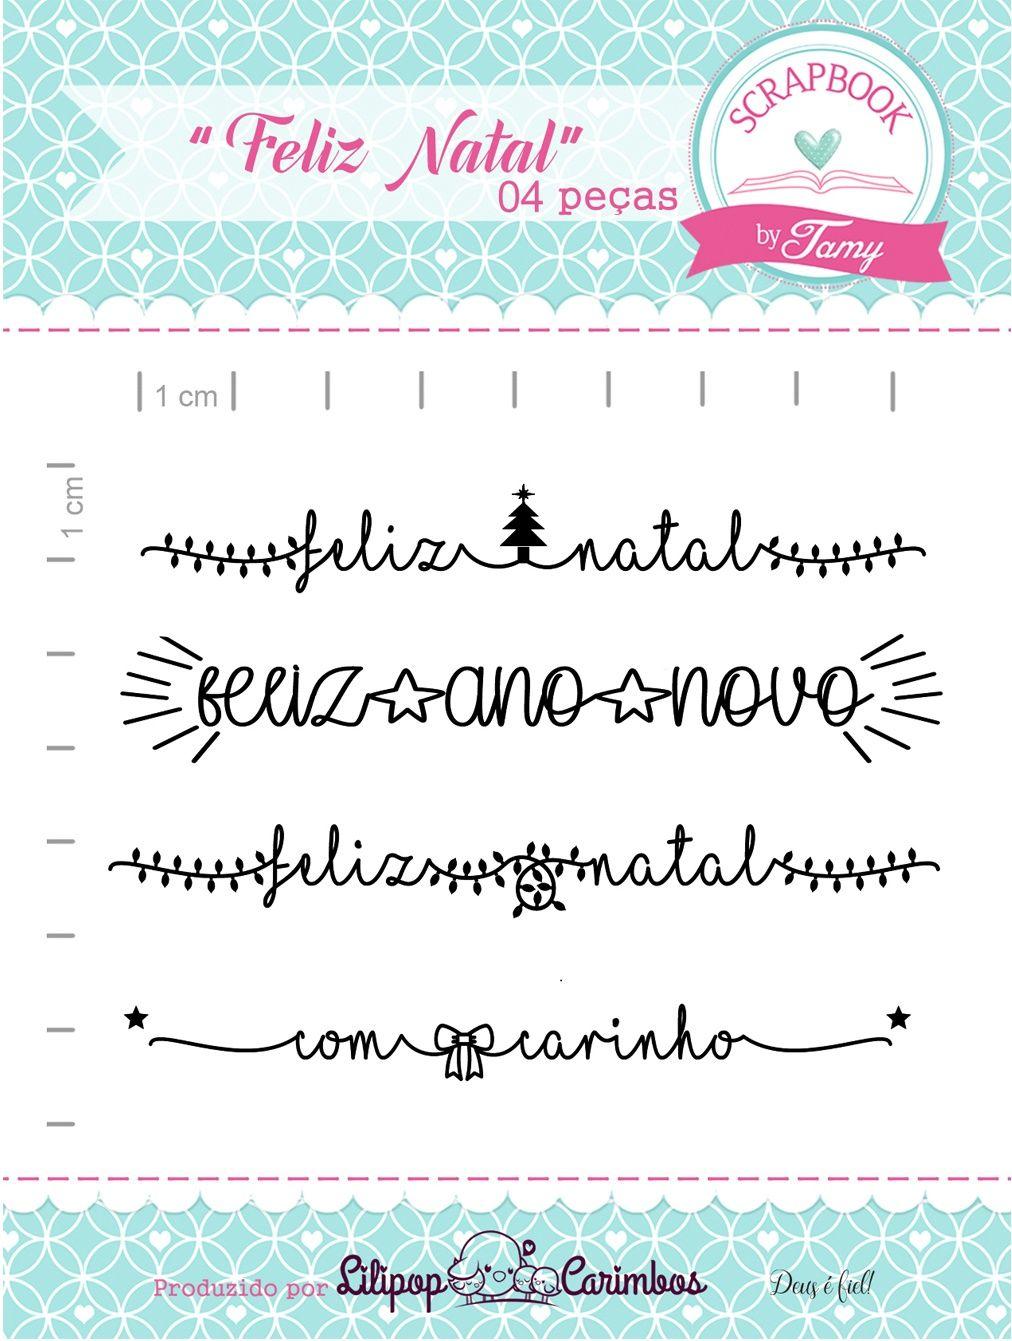 Kit de Carimbos - Feliz Natal - Scrapbook by Tamy